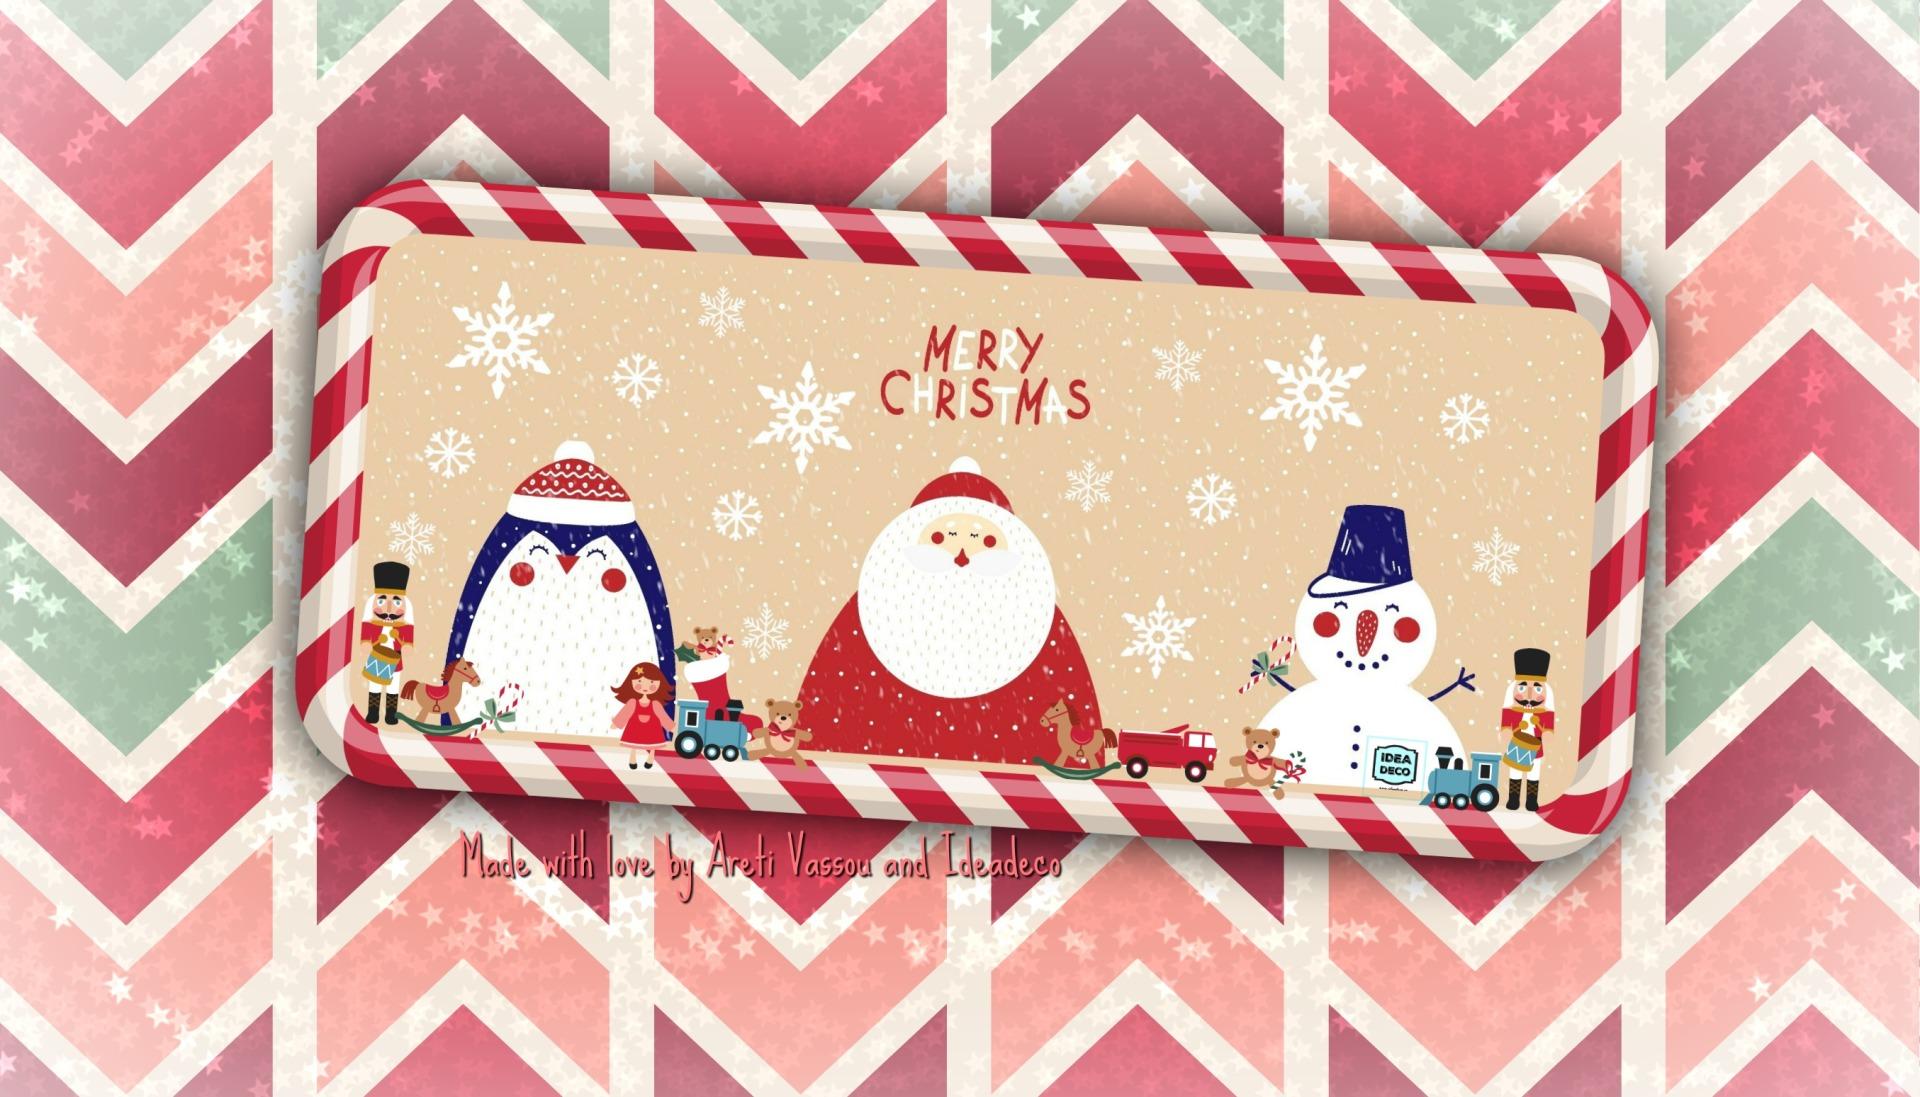 MERRY CHRISTMAS by IDEADECO ARETI VASSOU